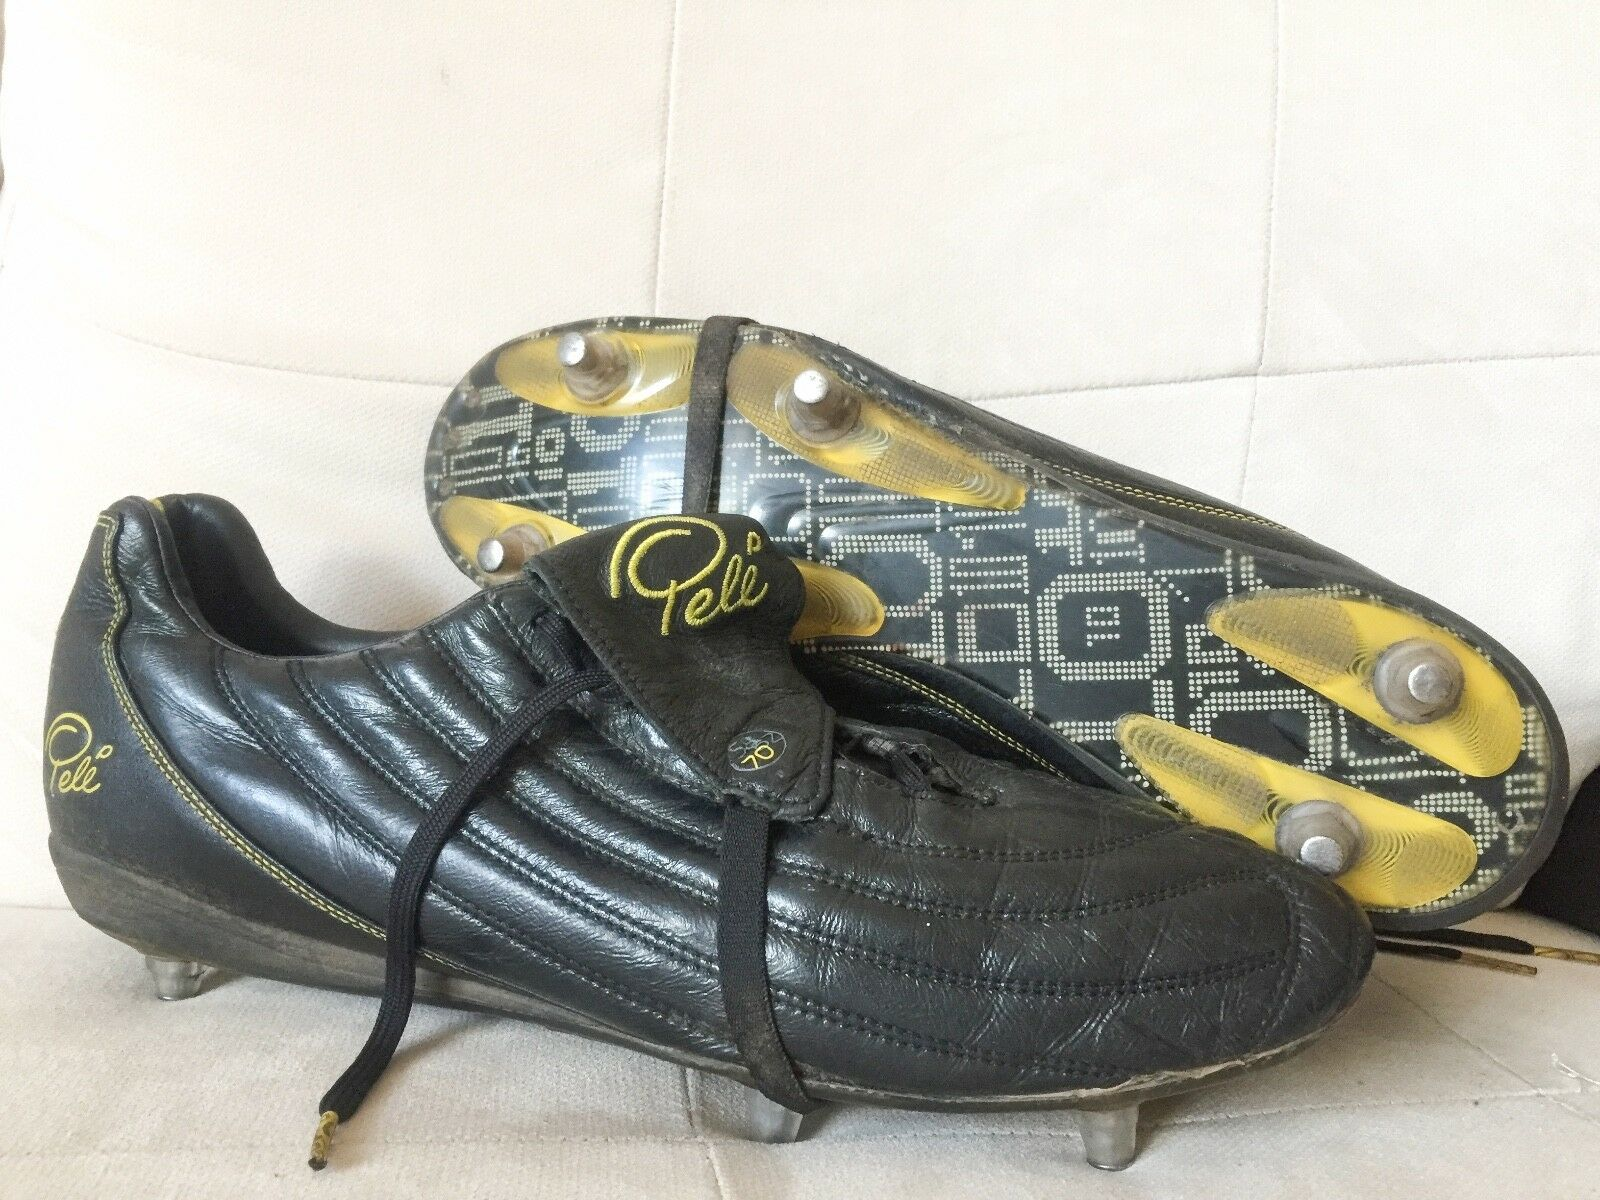 643e83585 PELE PELE PELE 1970 SG PRO Football BOOTS Soccer cleats KLeather US13  Predator Mercurial d84700